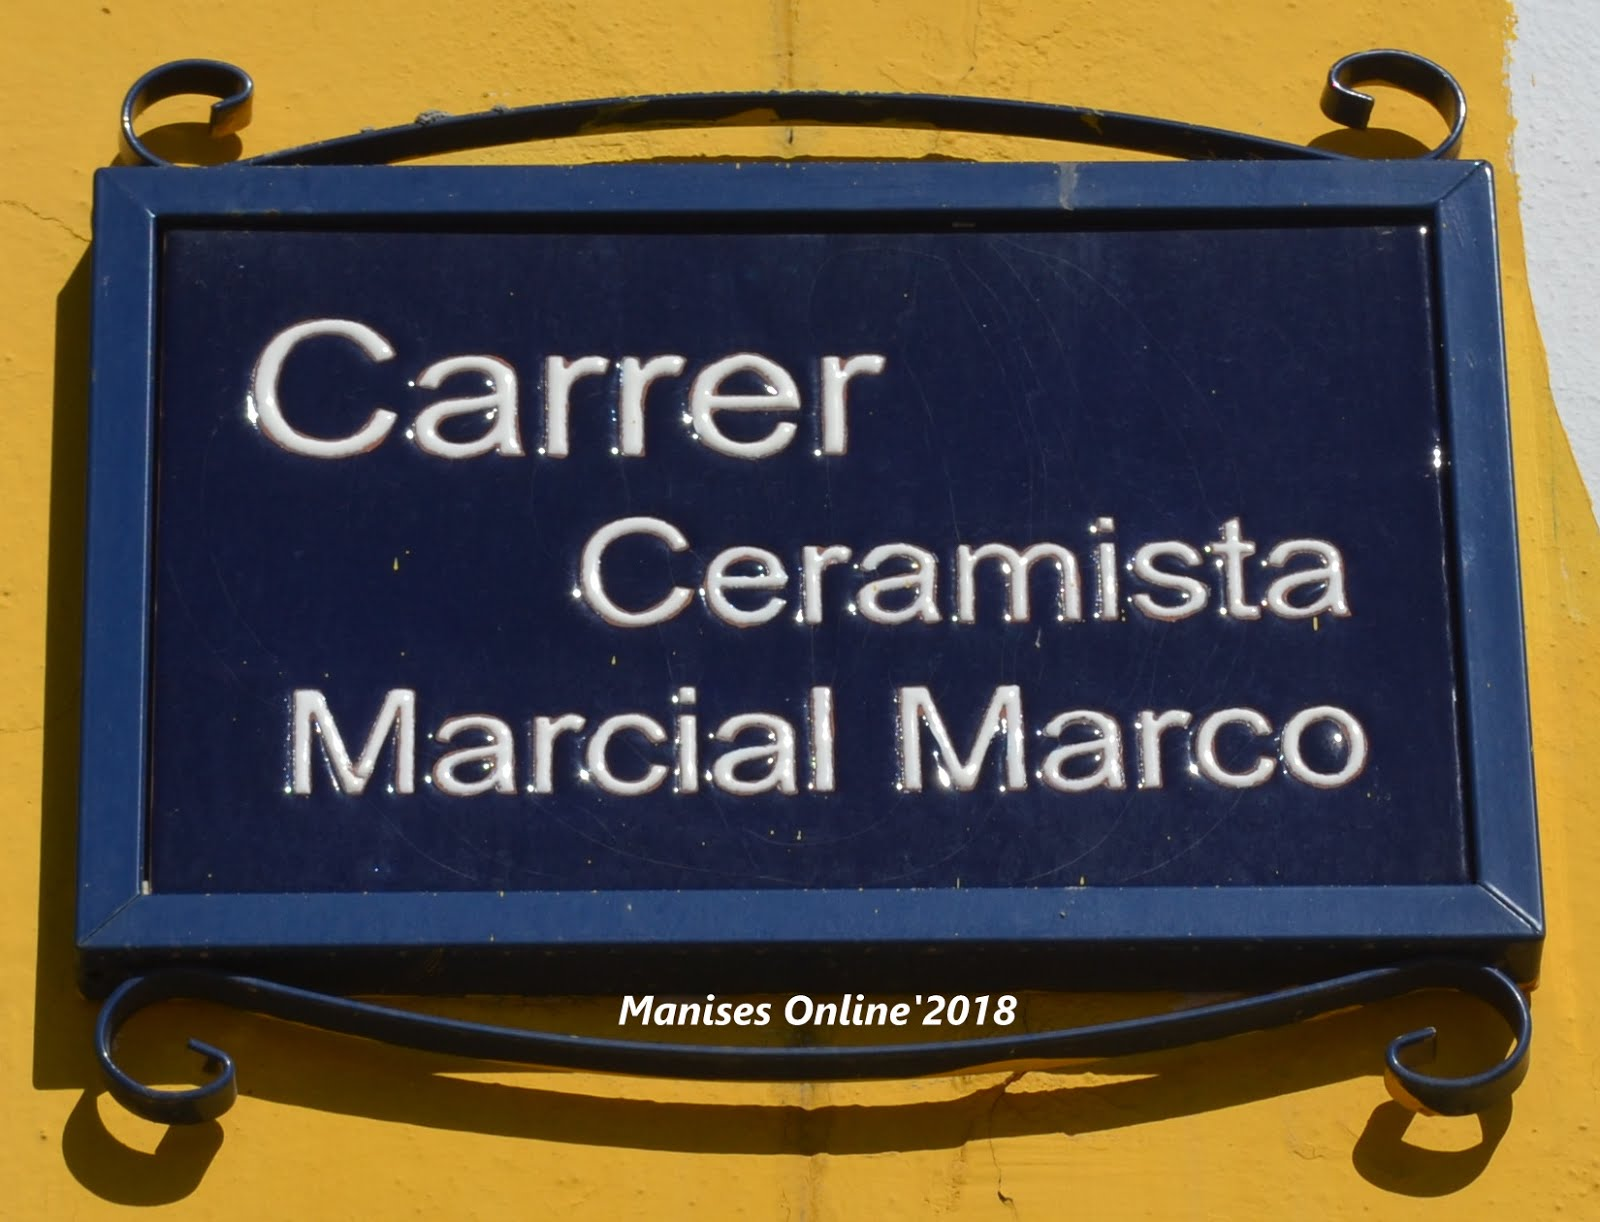 15.02.18 CARRERS-CALLES DE LA CIUDAD DE MANISES: CERAMISTE MARCIAL MARCO